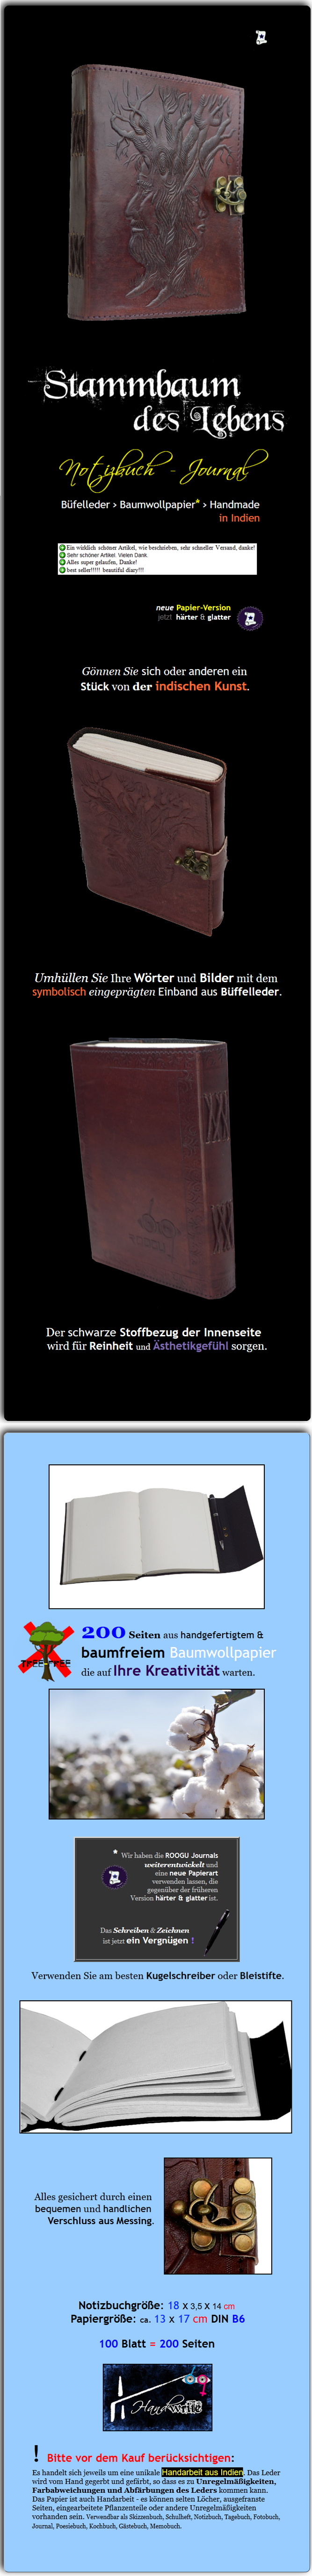 http://roogu.com/auction/stammbaumdeslebens.png